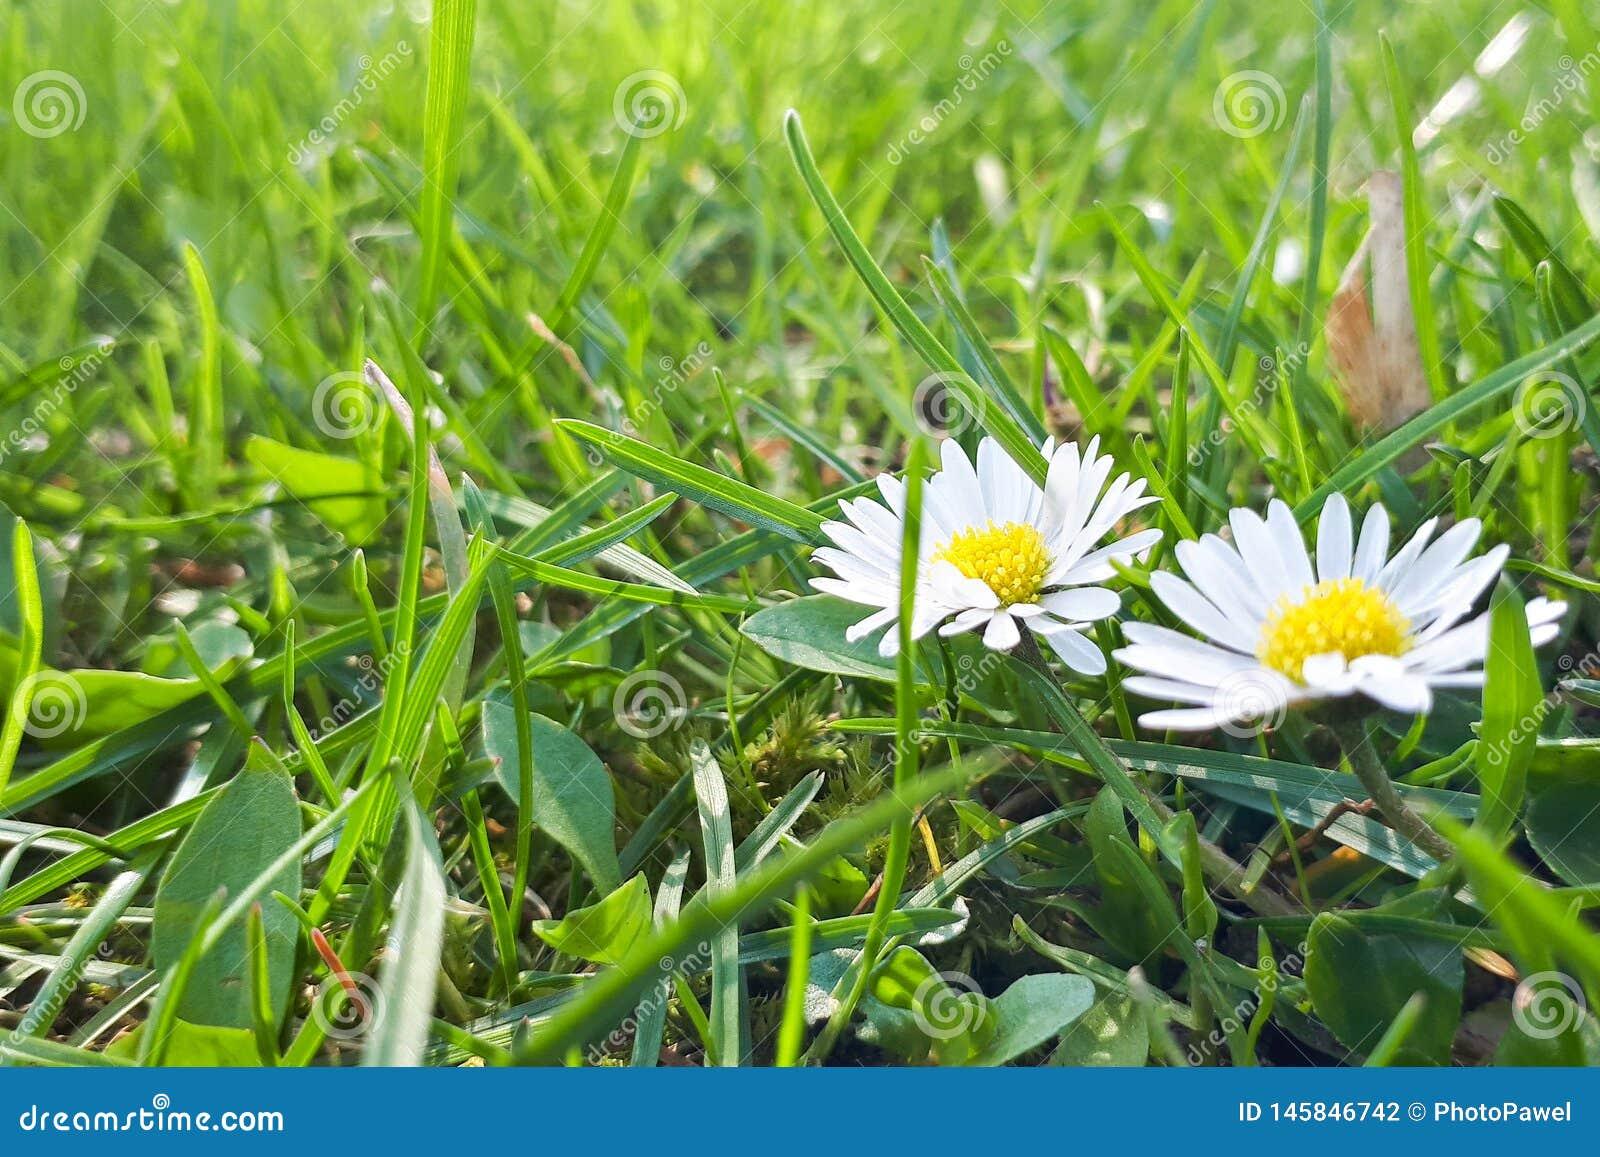 Dewy daisy flowers in grass. Soft focus.